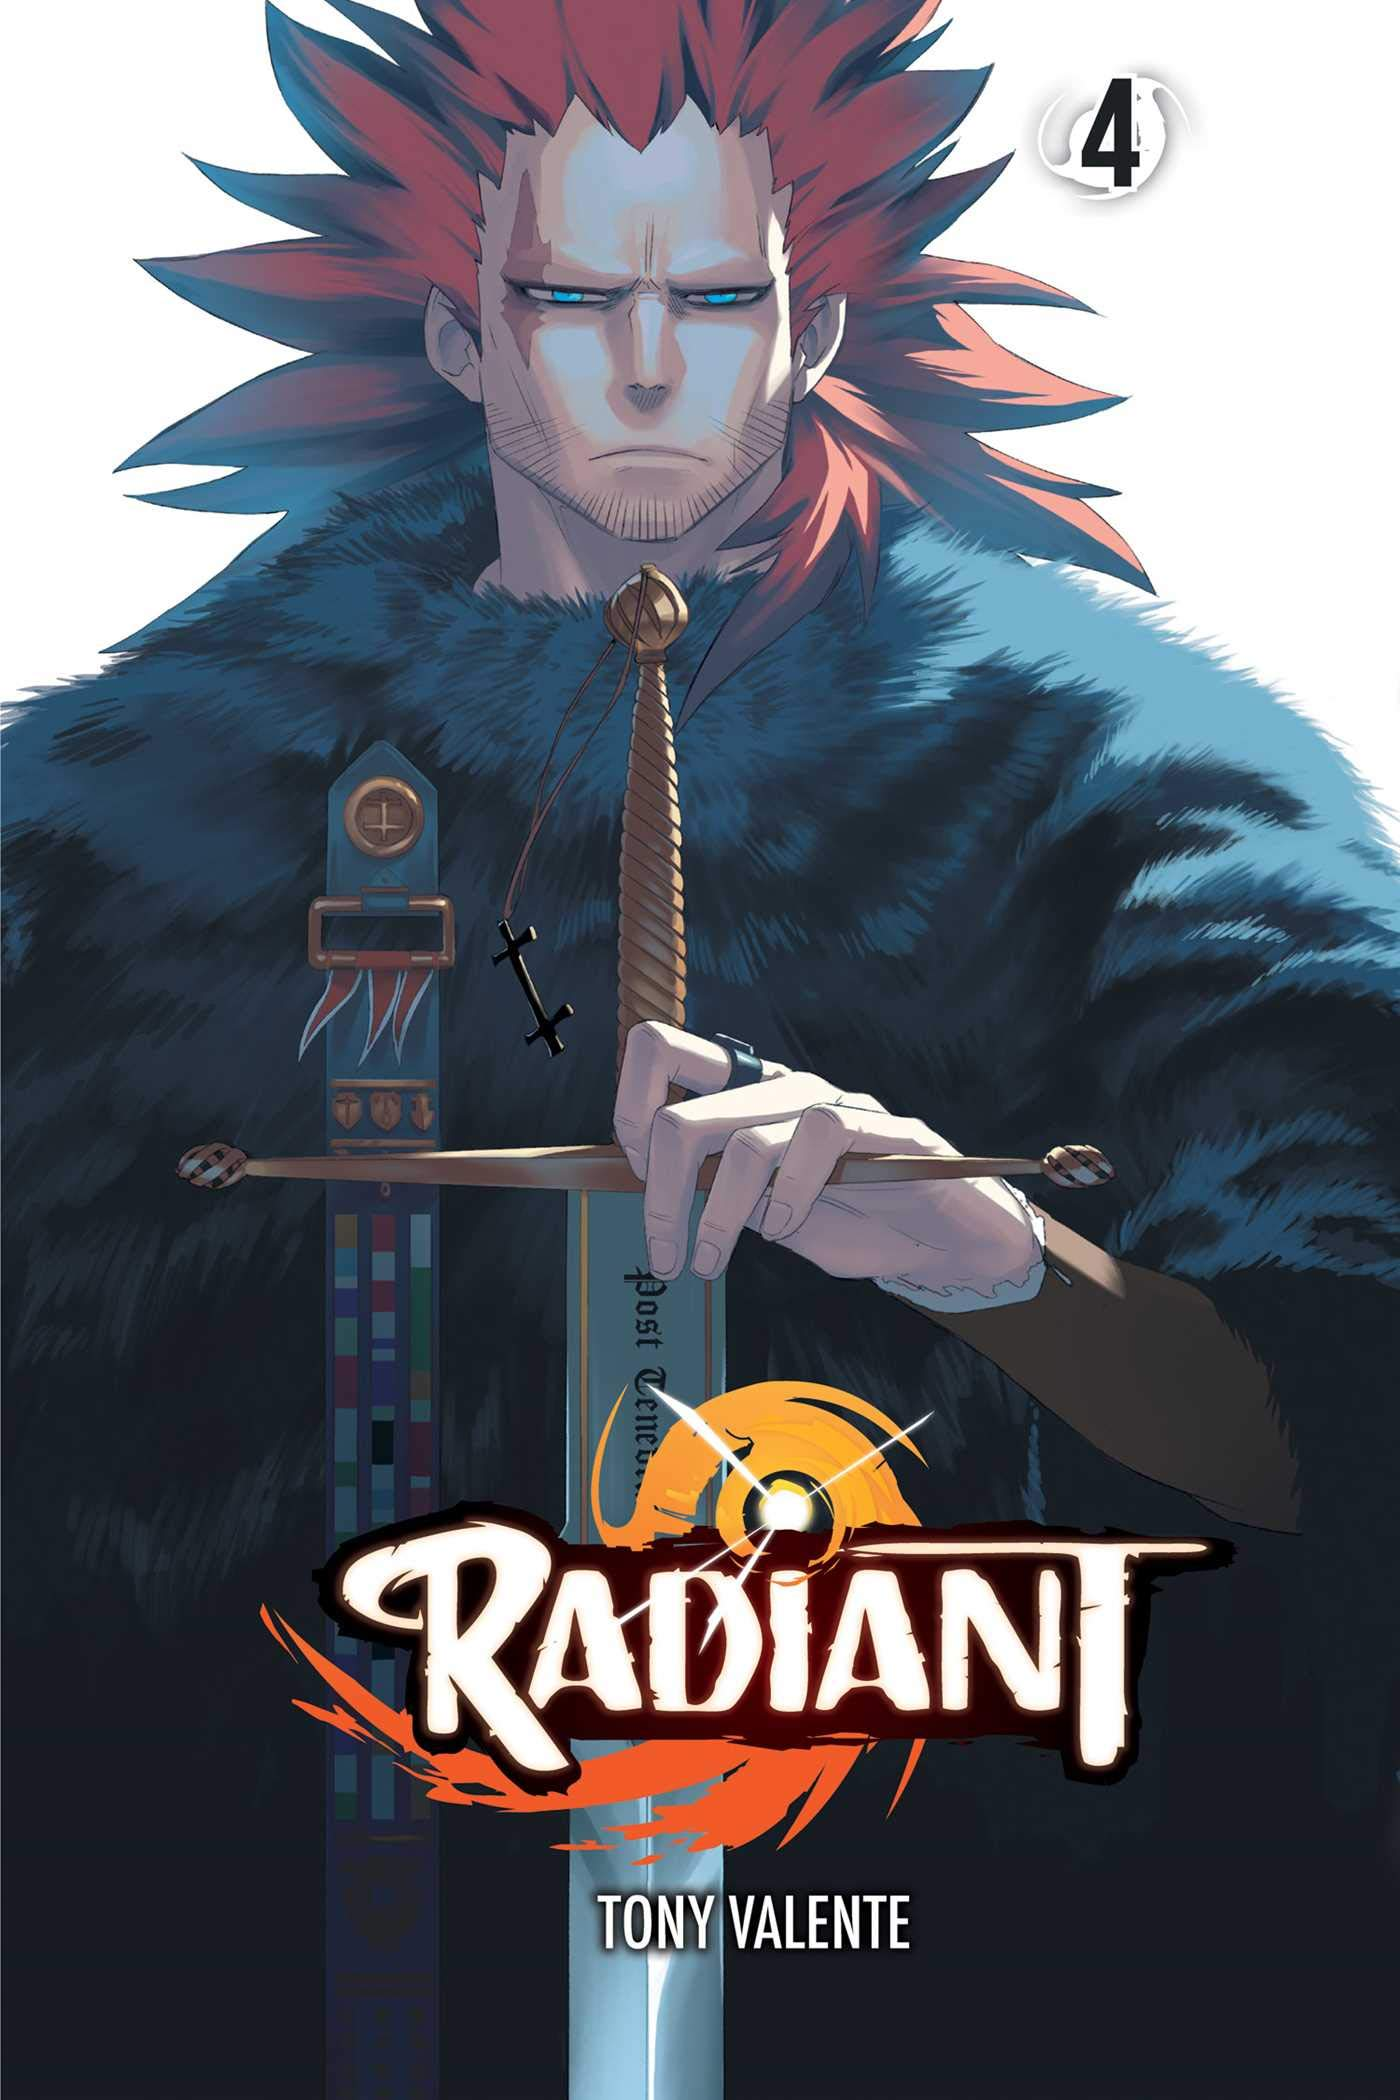 Radiant Vol 4 Tony Valente